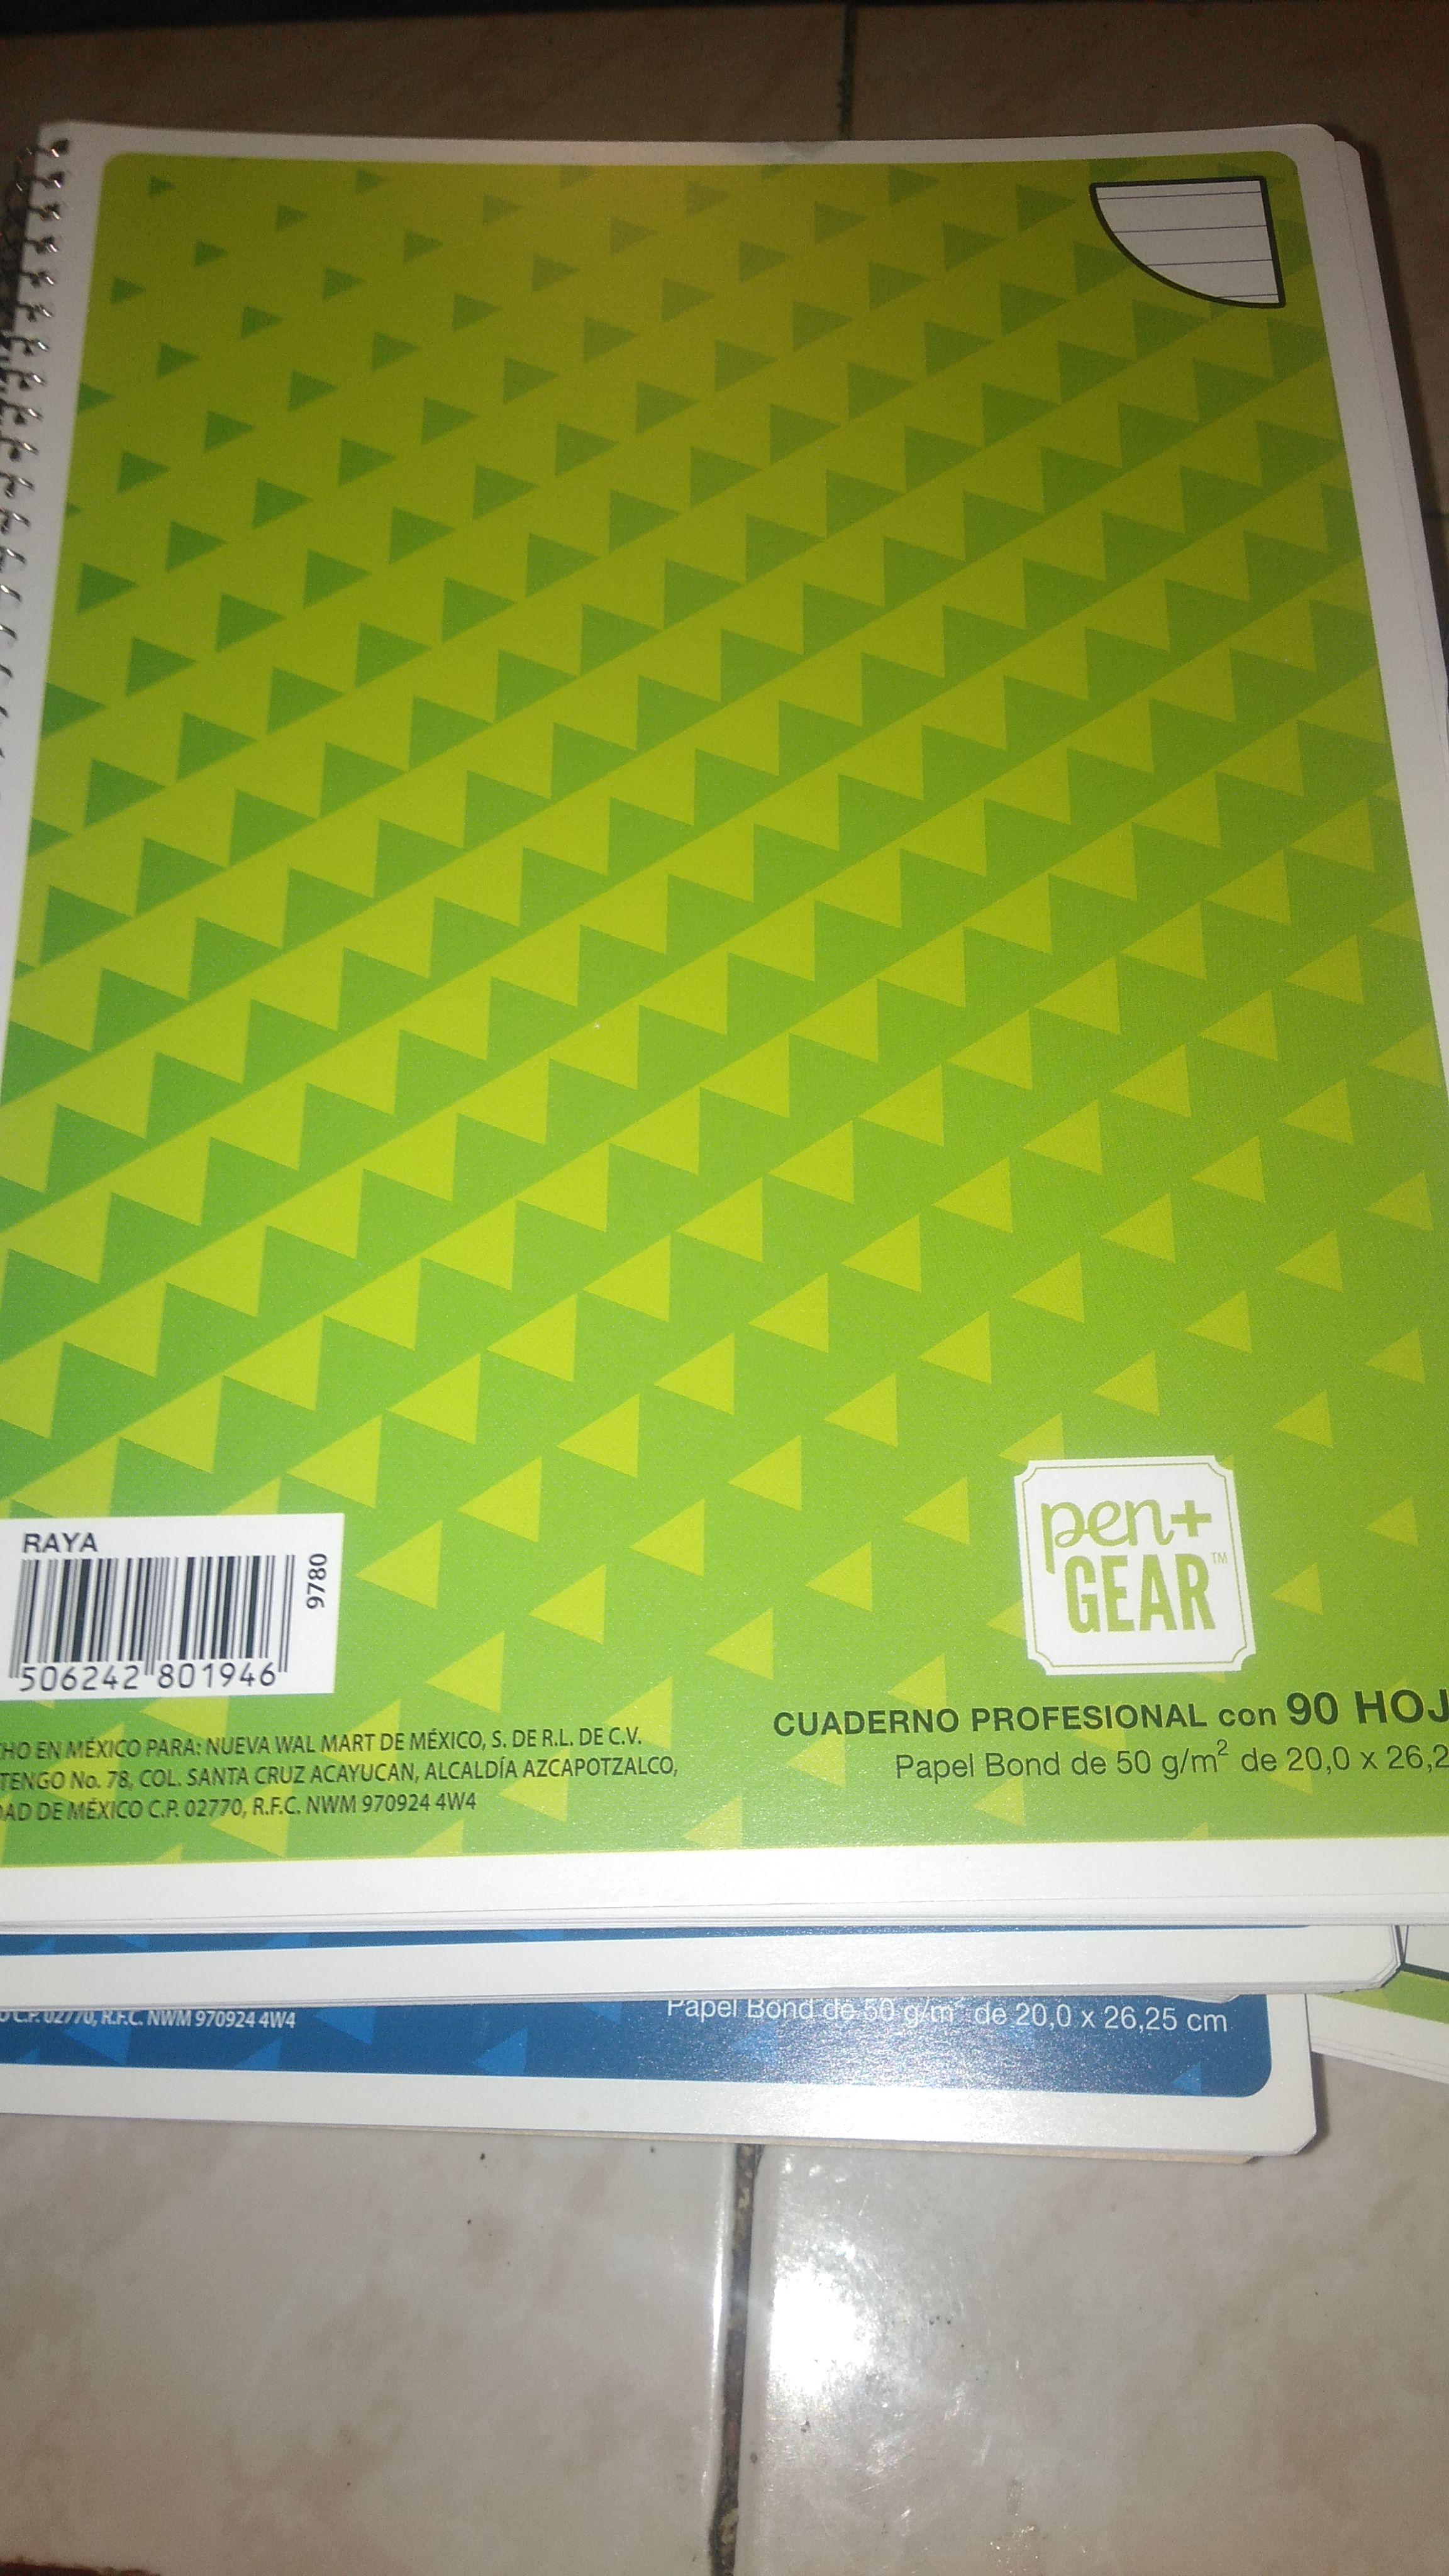 Bodega Aurrerá: Cuaderno de raya 5x25 90 hojas.